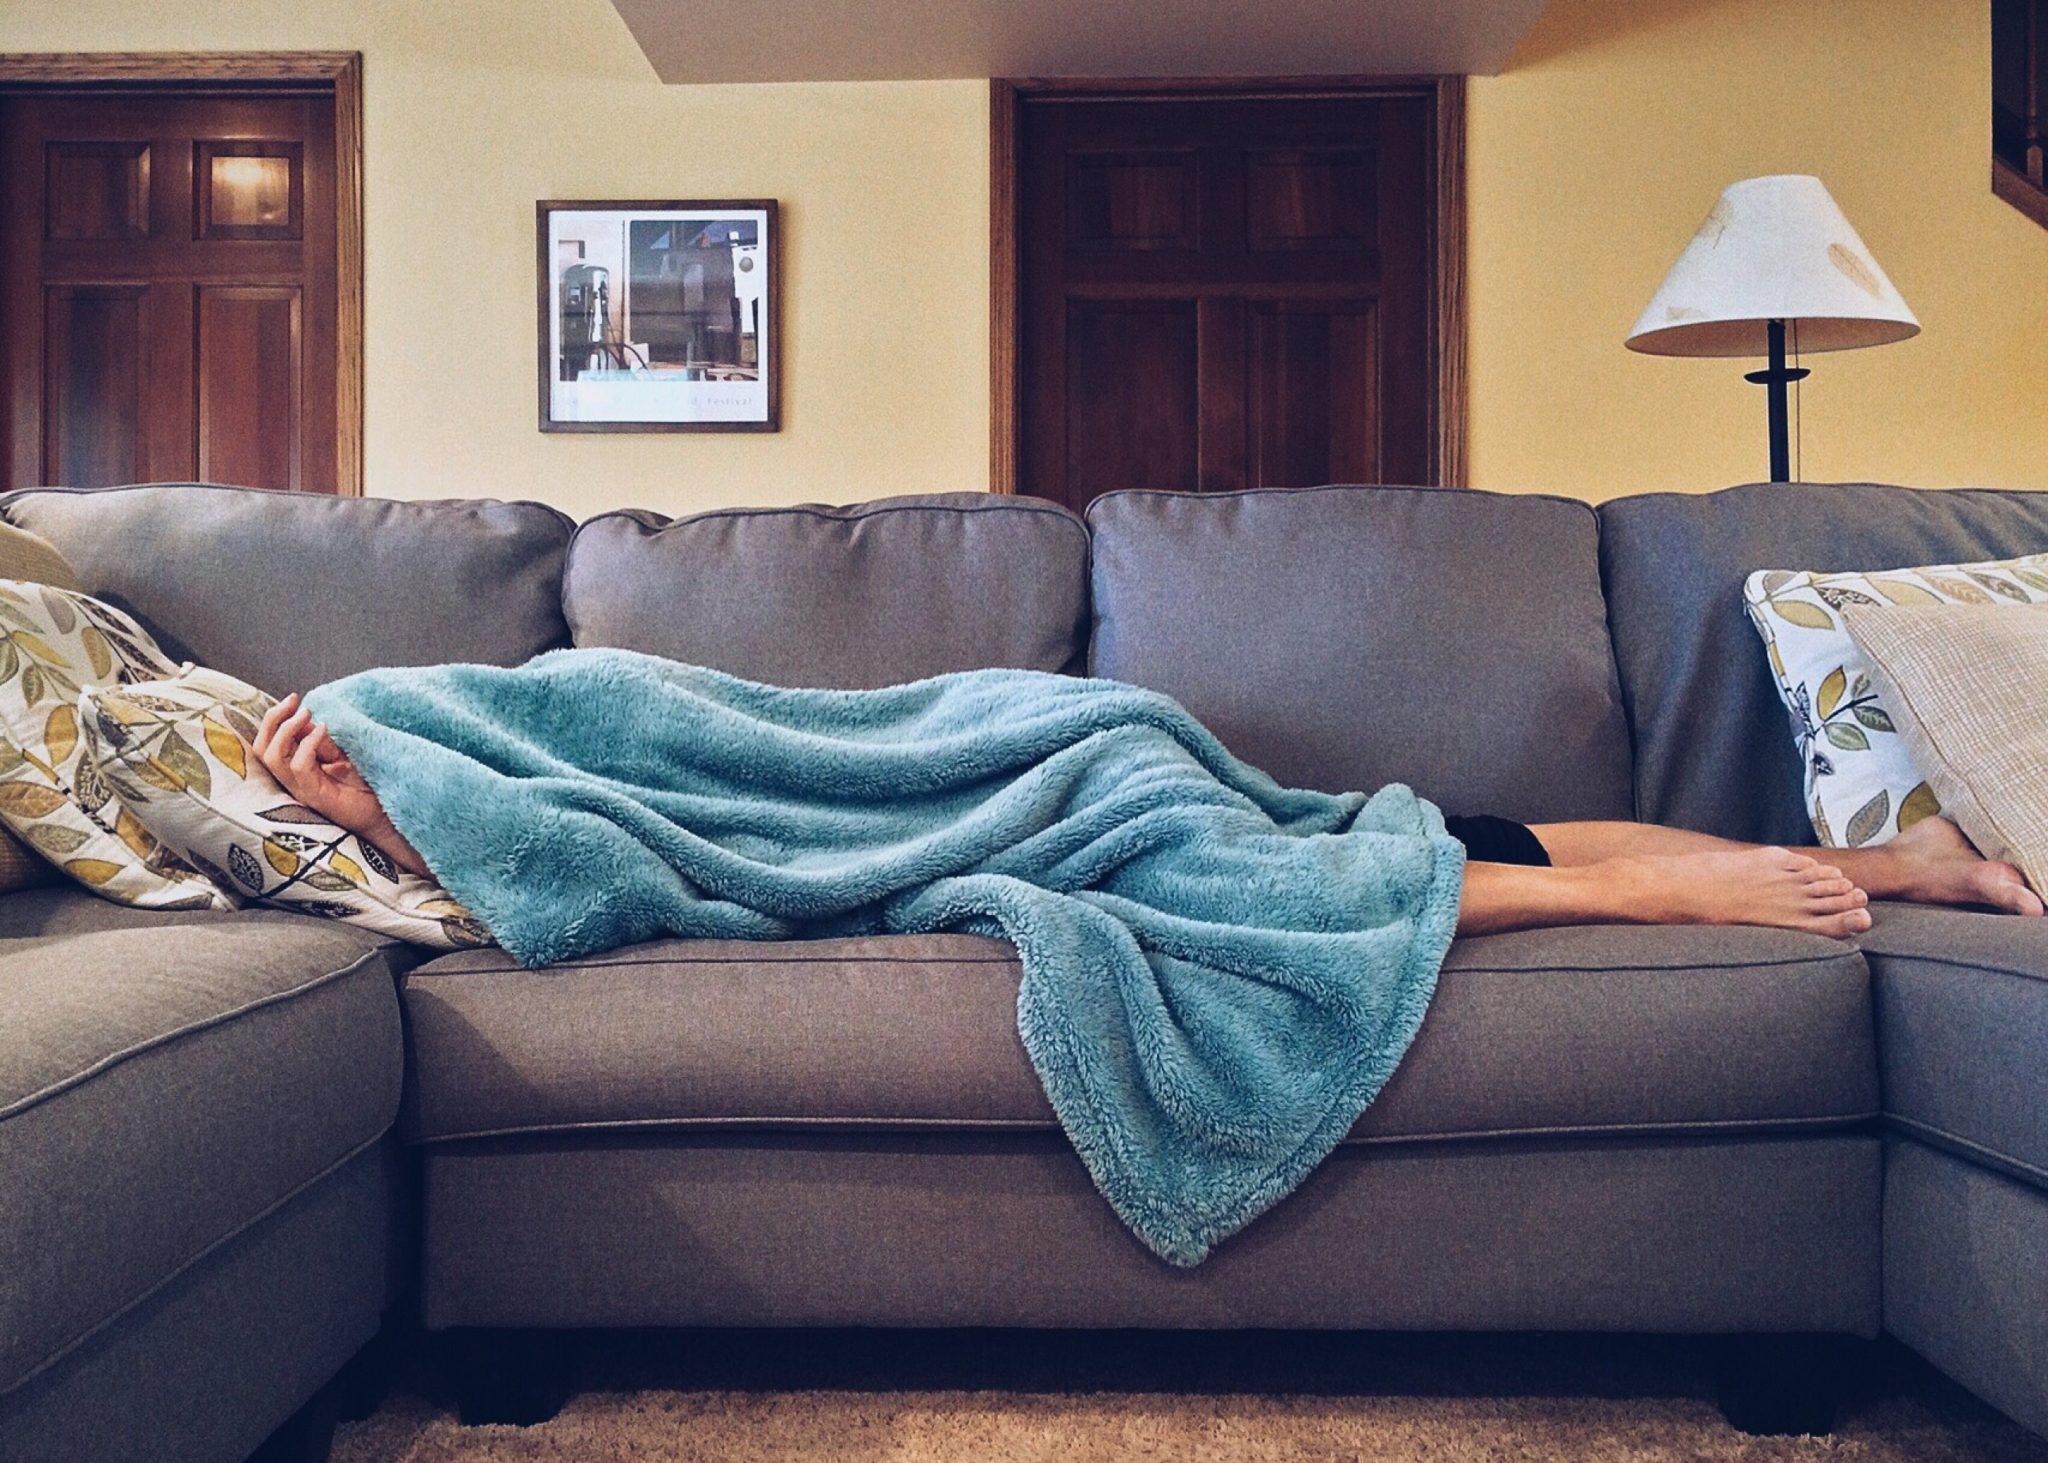 Why Do I Sleep So Much When I'm Sick